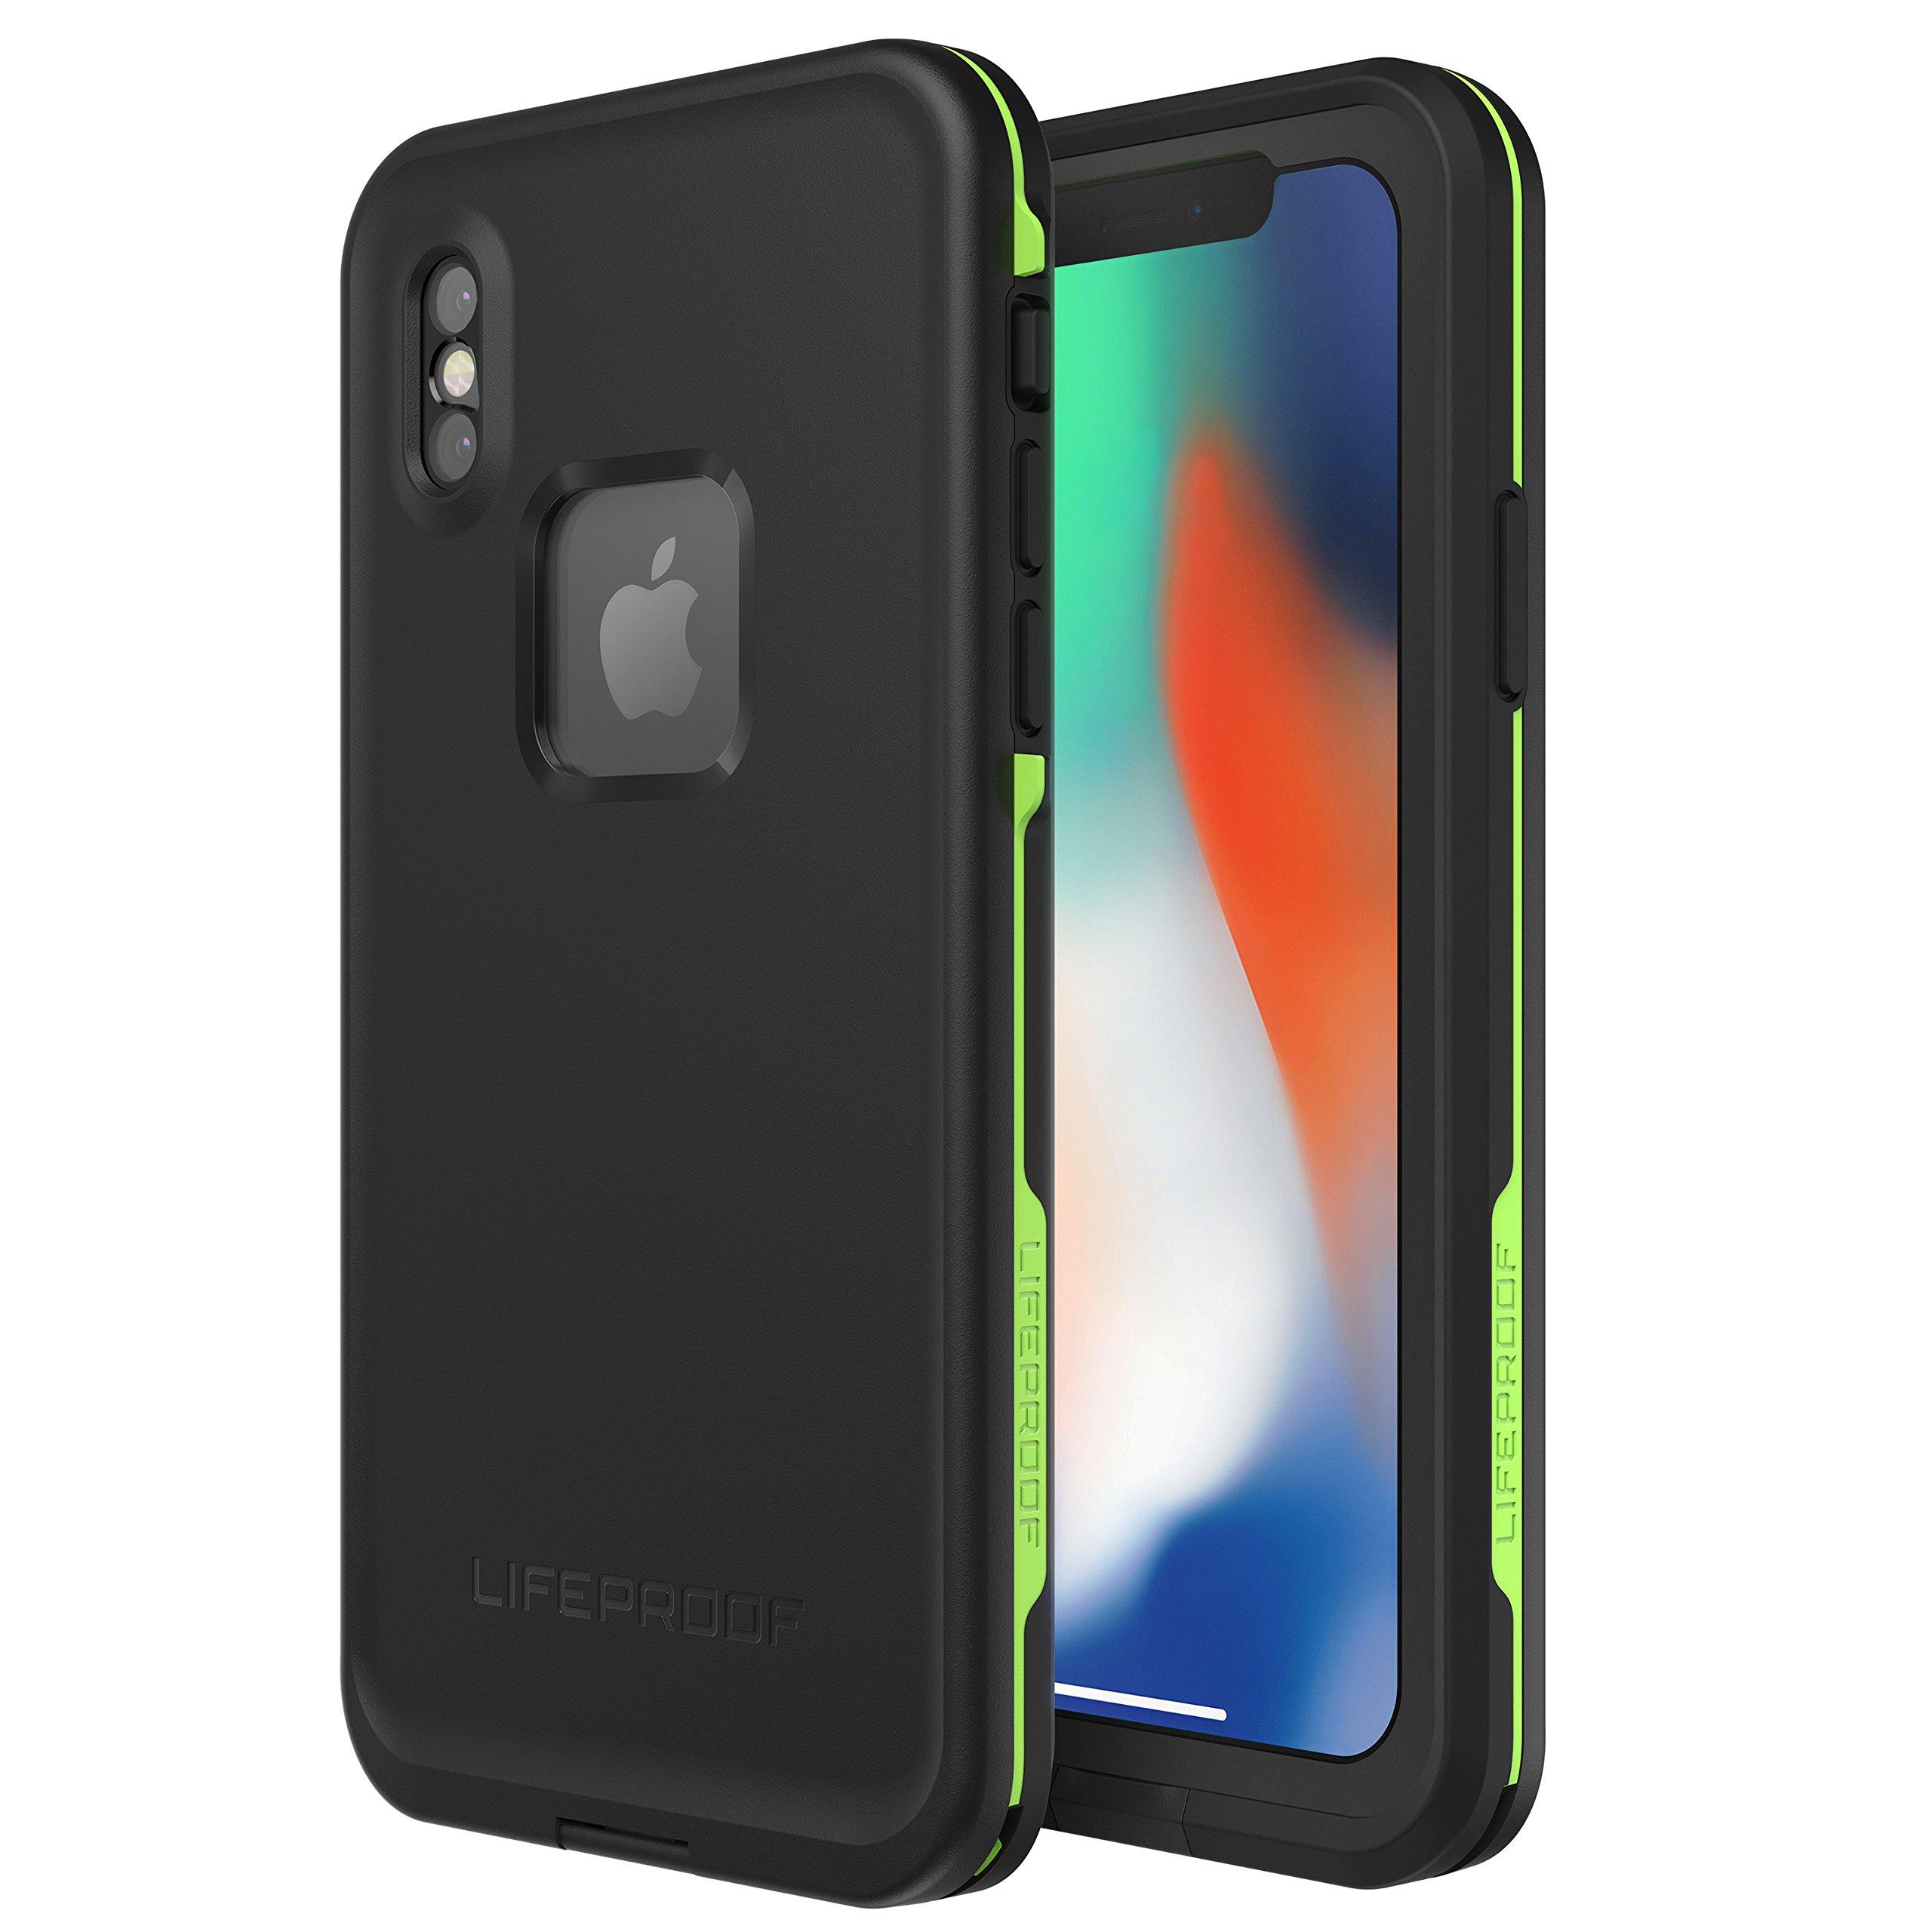 Lifeproof FRĒ SERIES Waterproof Case for iPhone X (ONLY) - Retail Packaging - NIGHT LITE (BLACK/LIME) by LifeProof